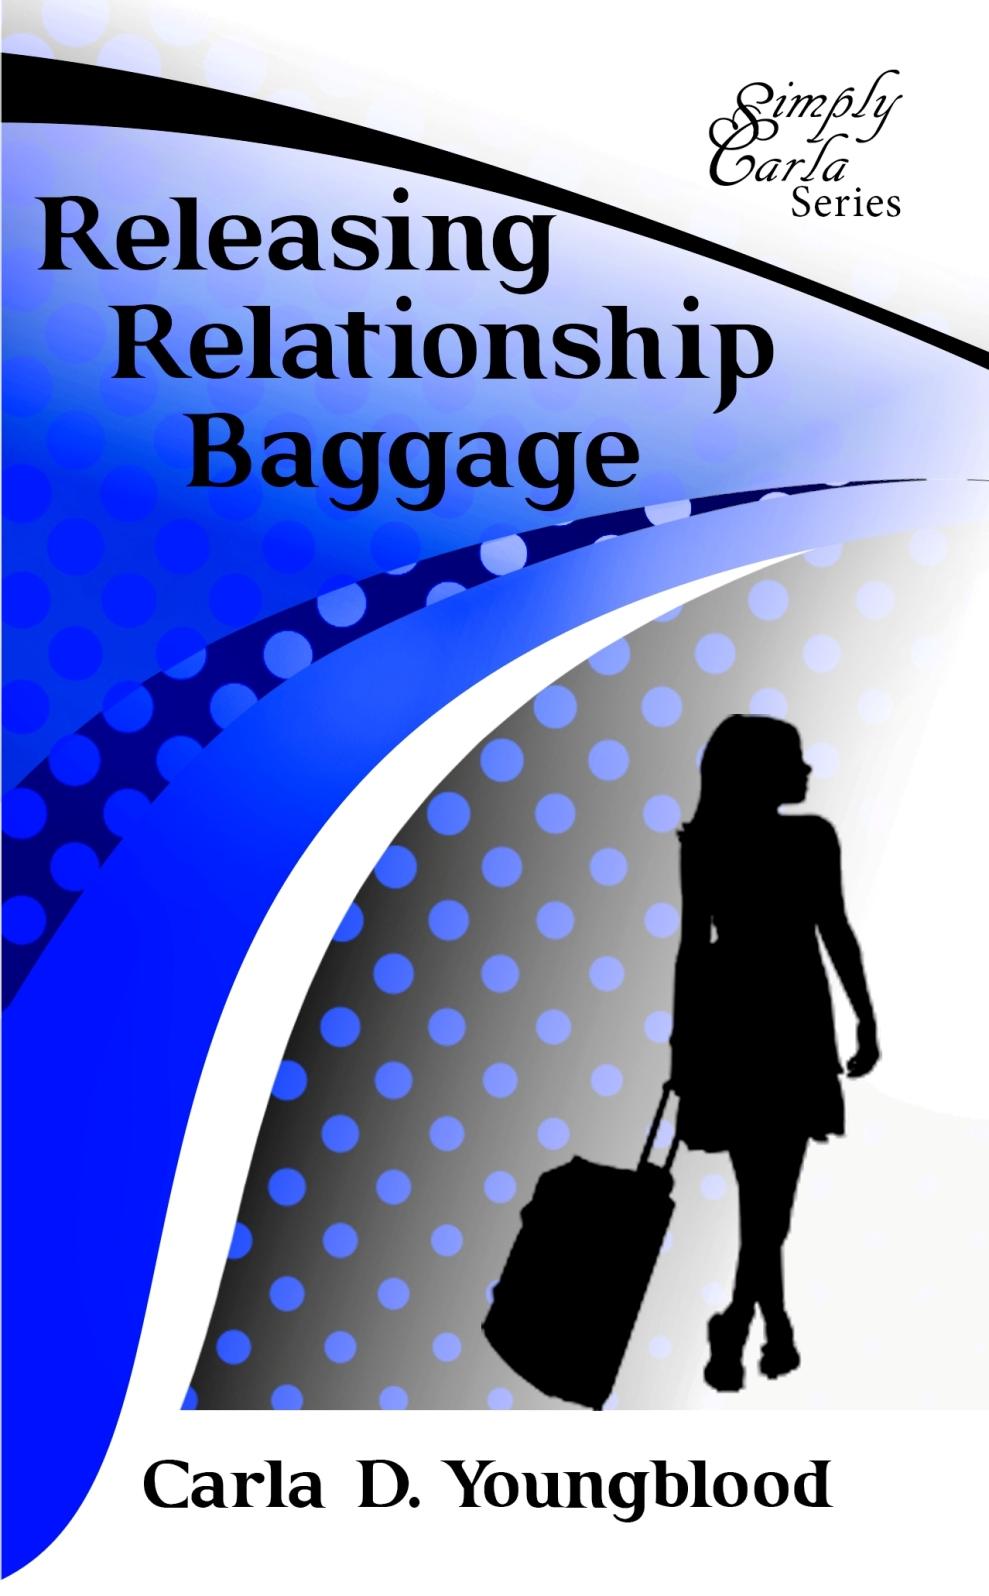 Releasing Relationship baggage[9585]